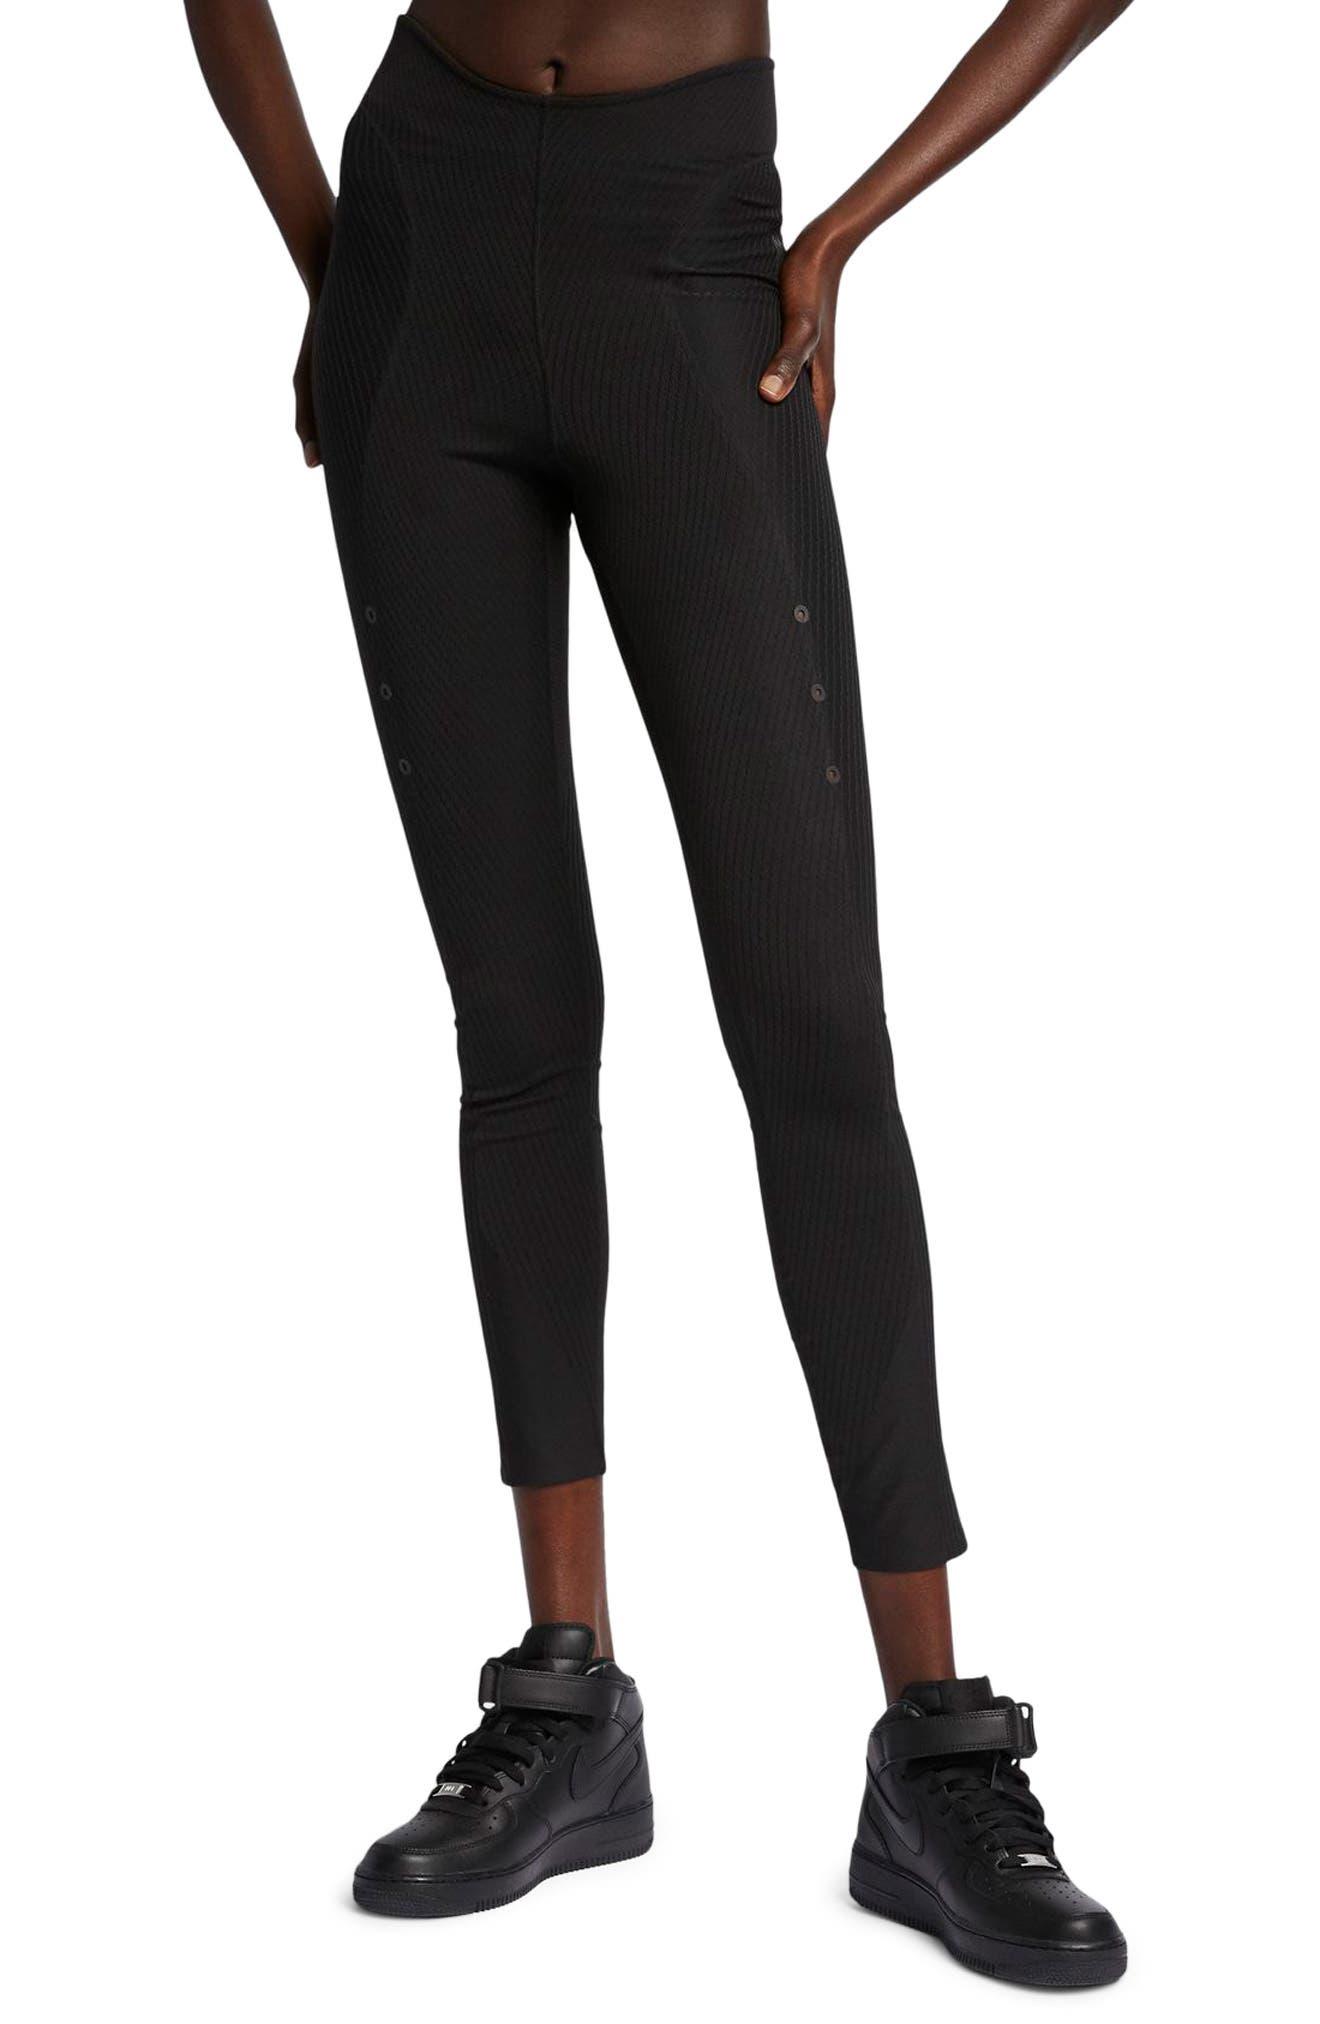 NIKE NikeLab Women's Tights, Main, color, 010